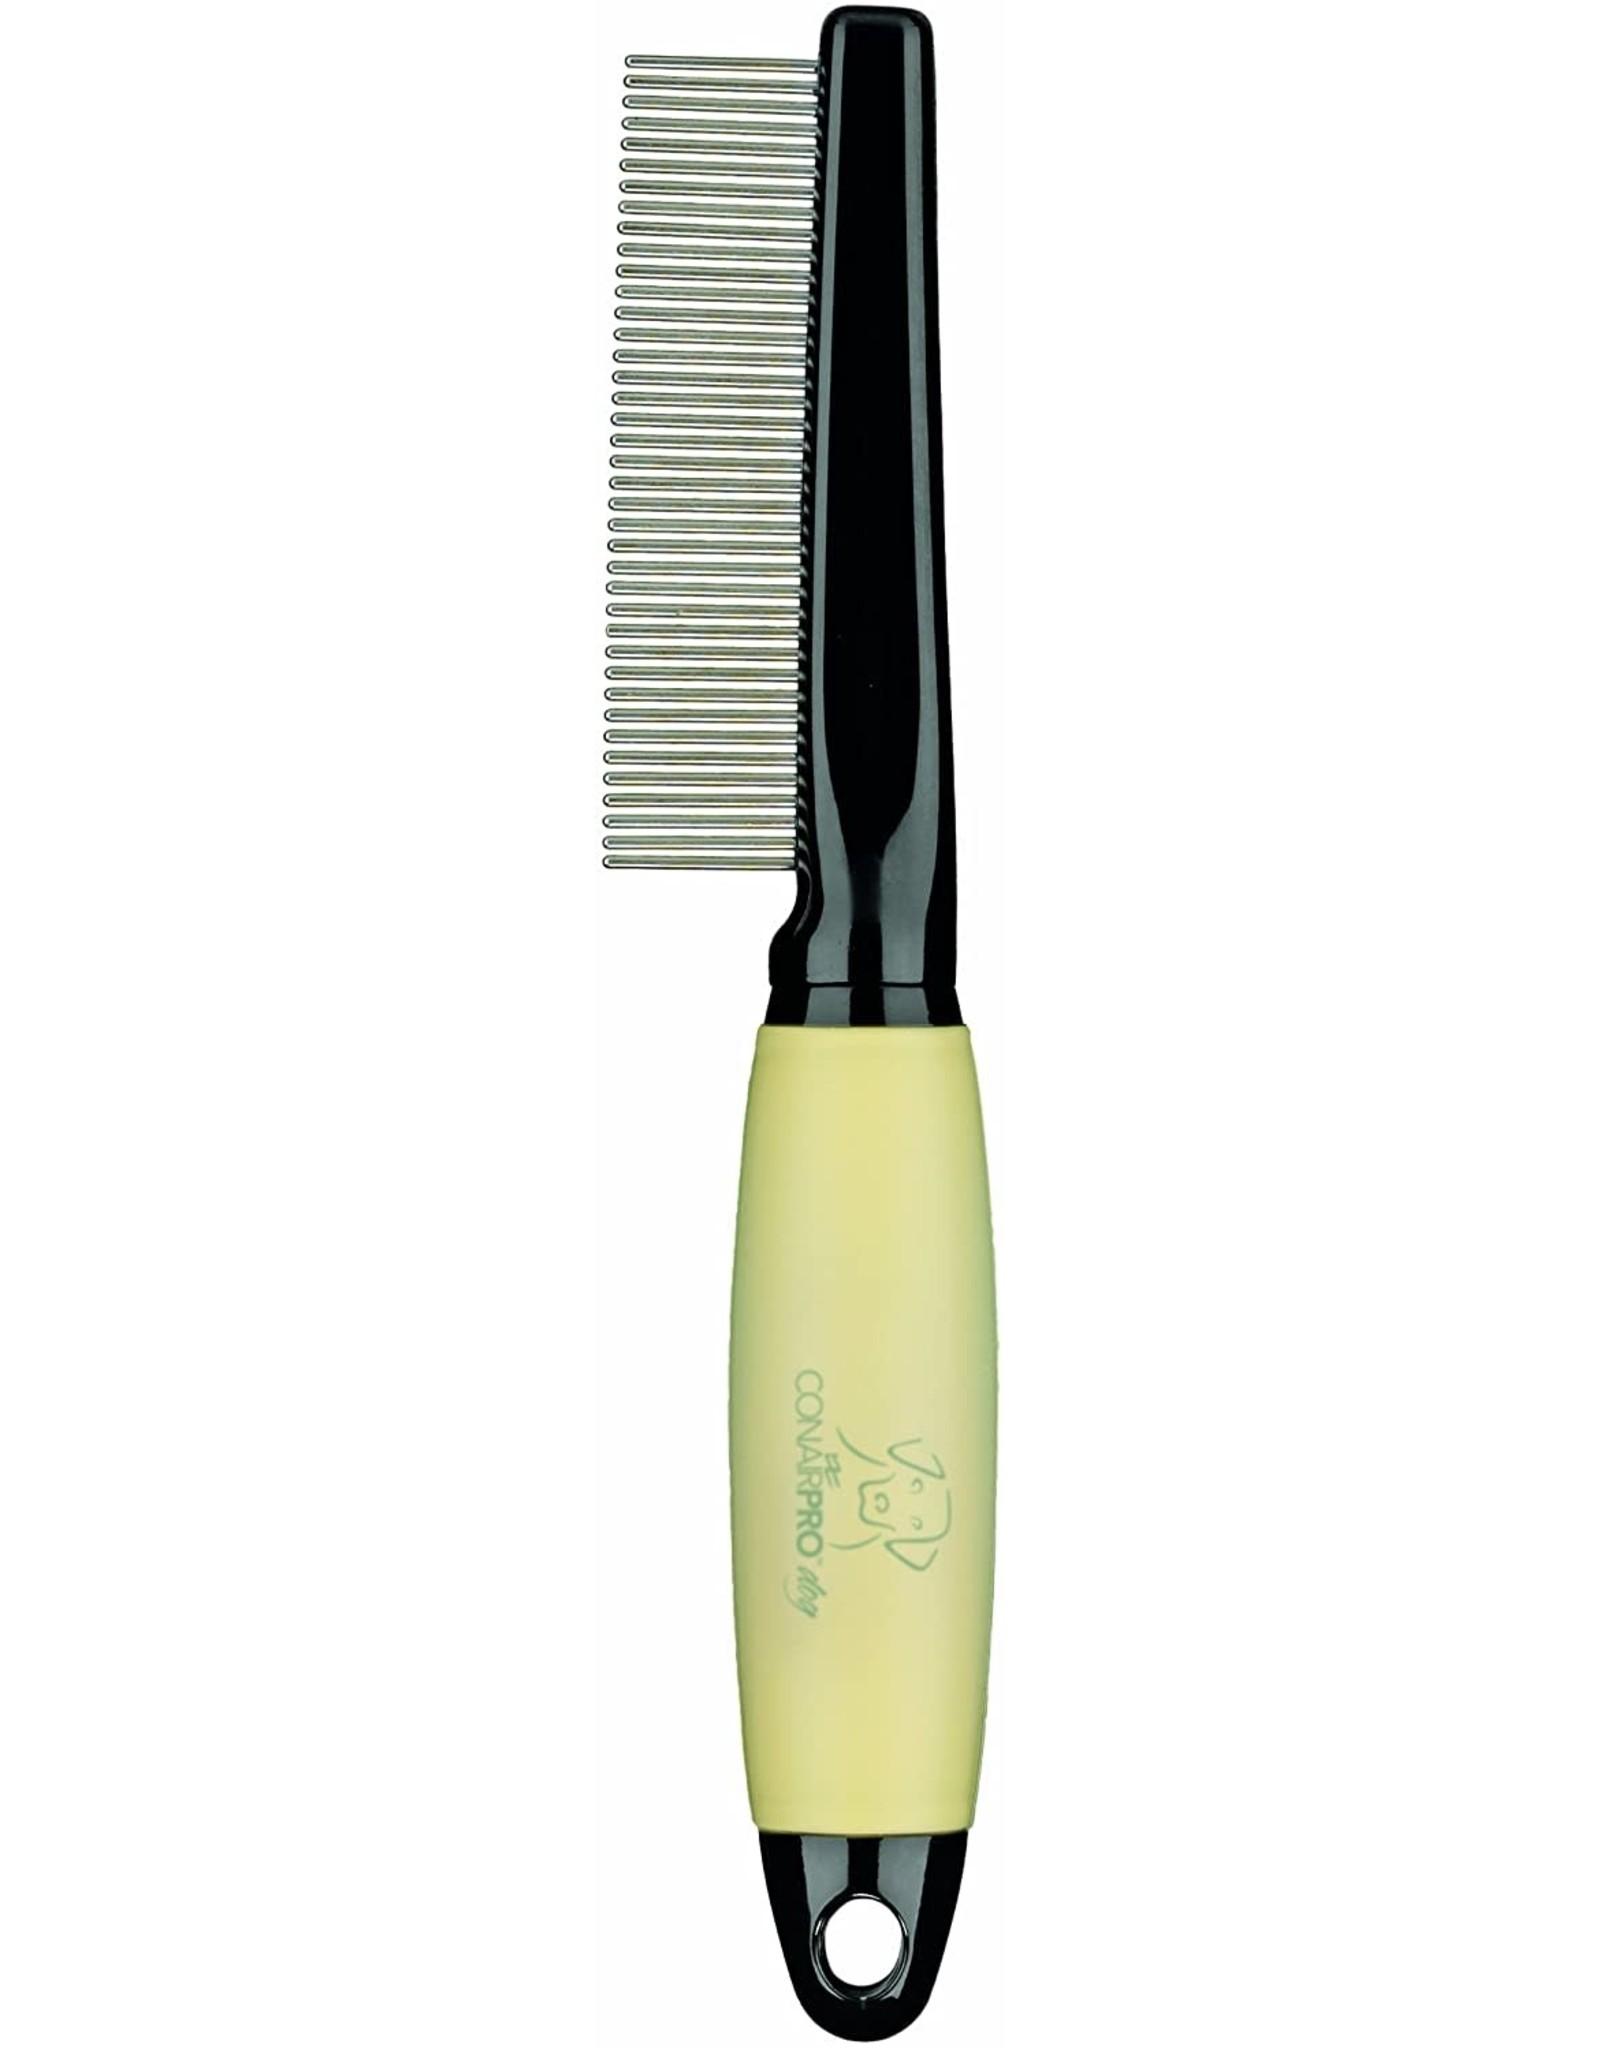 ConairPro Conair Pro Dog Memory Gel Grip Comb Medium